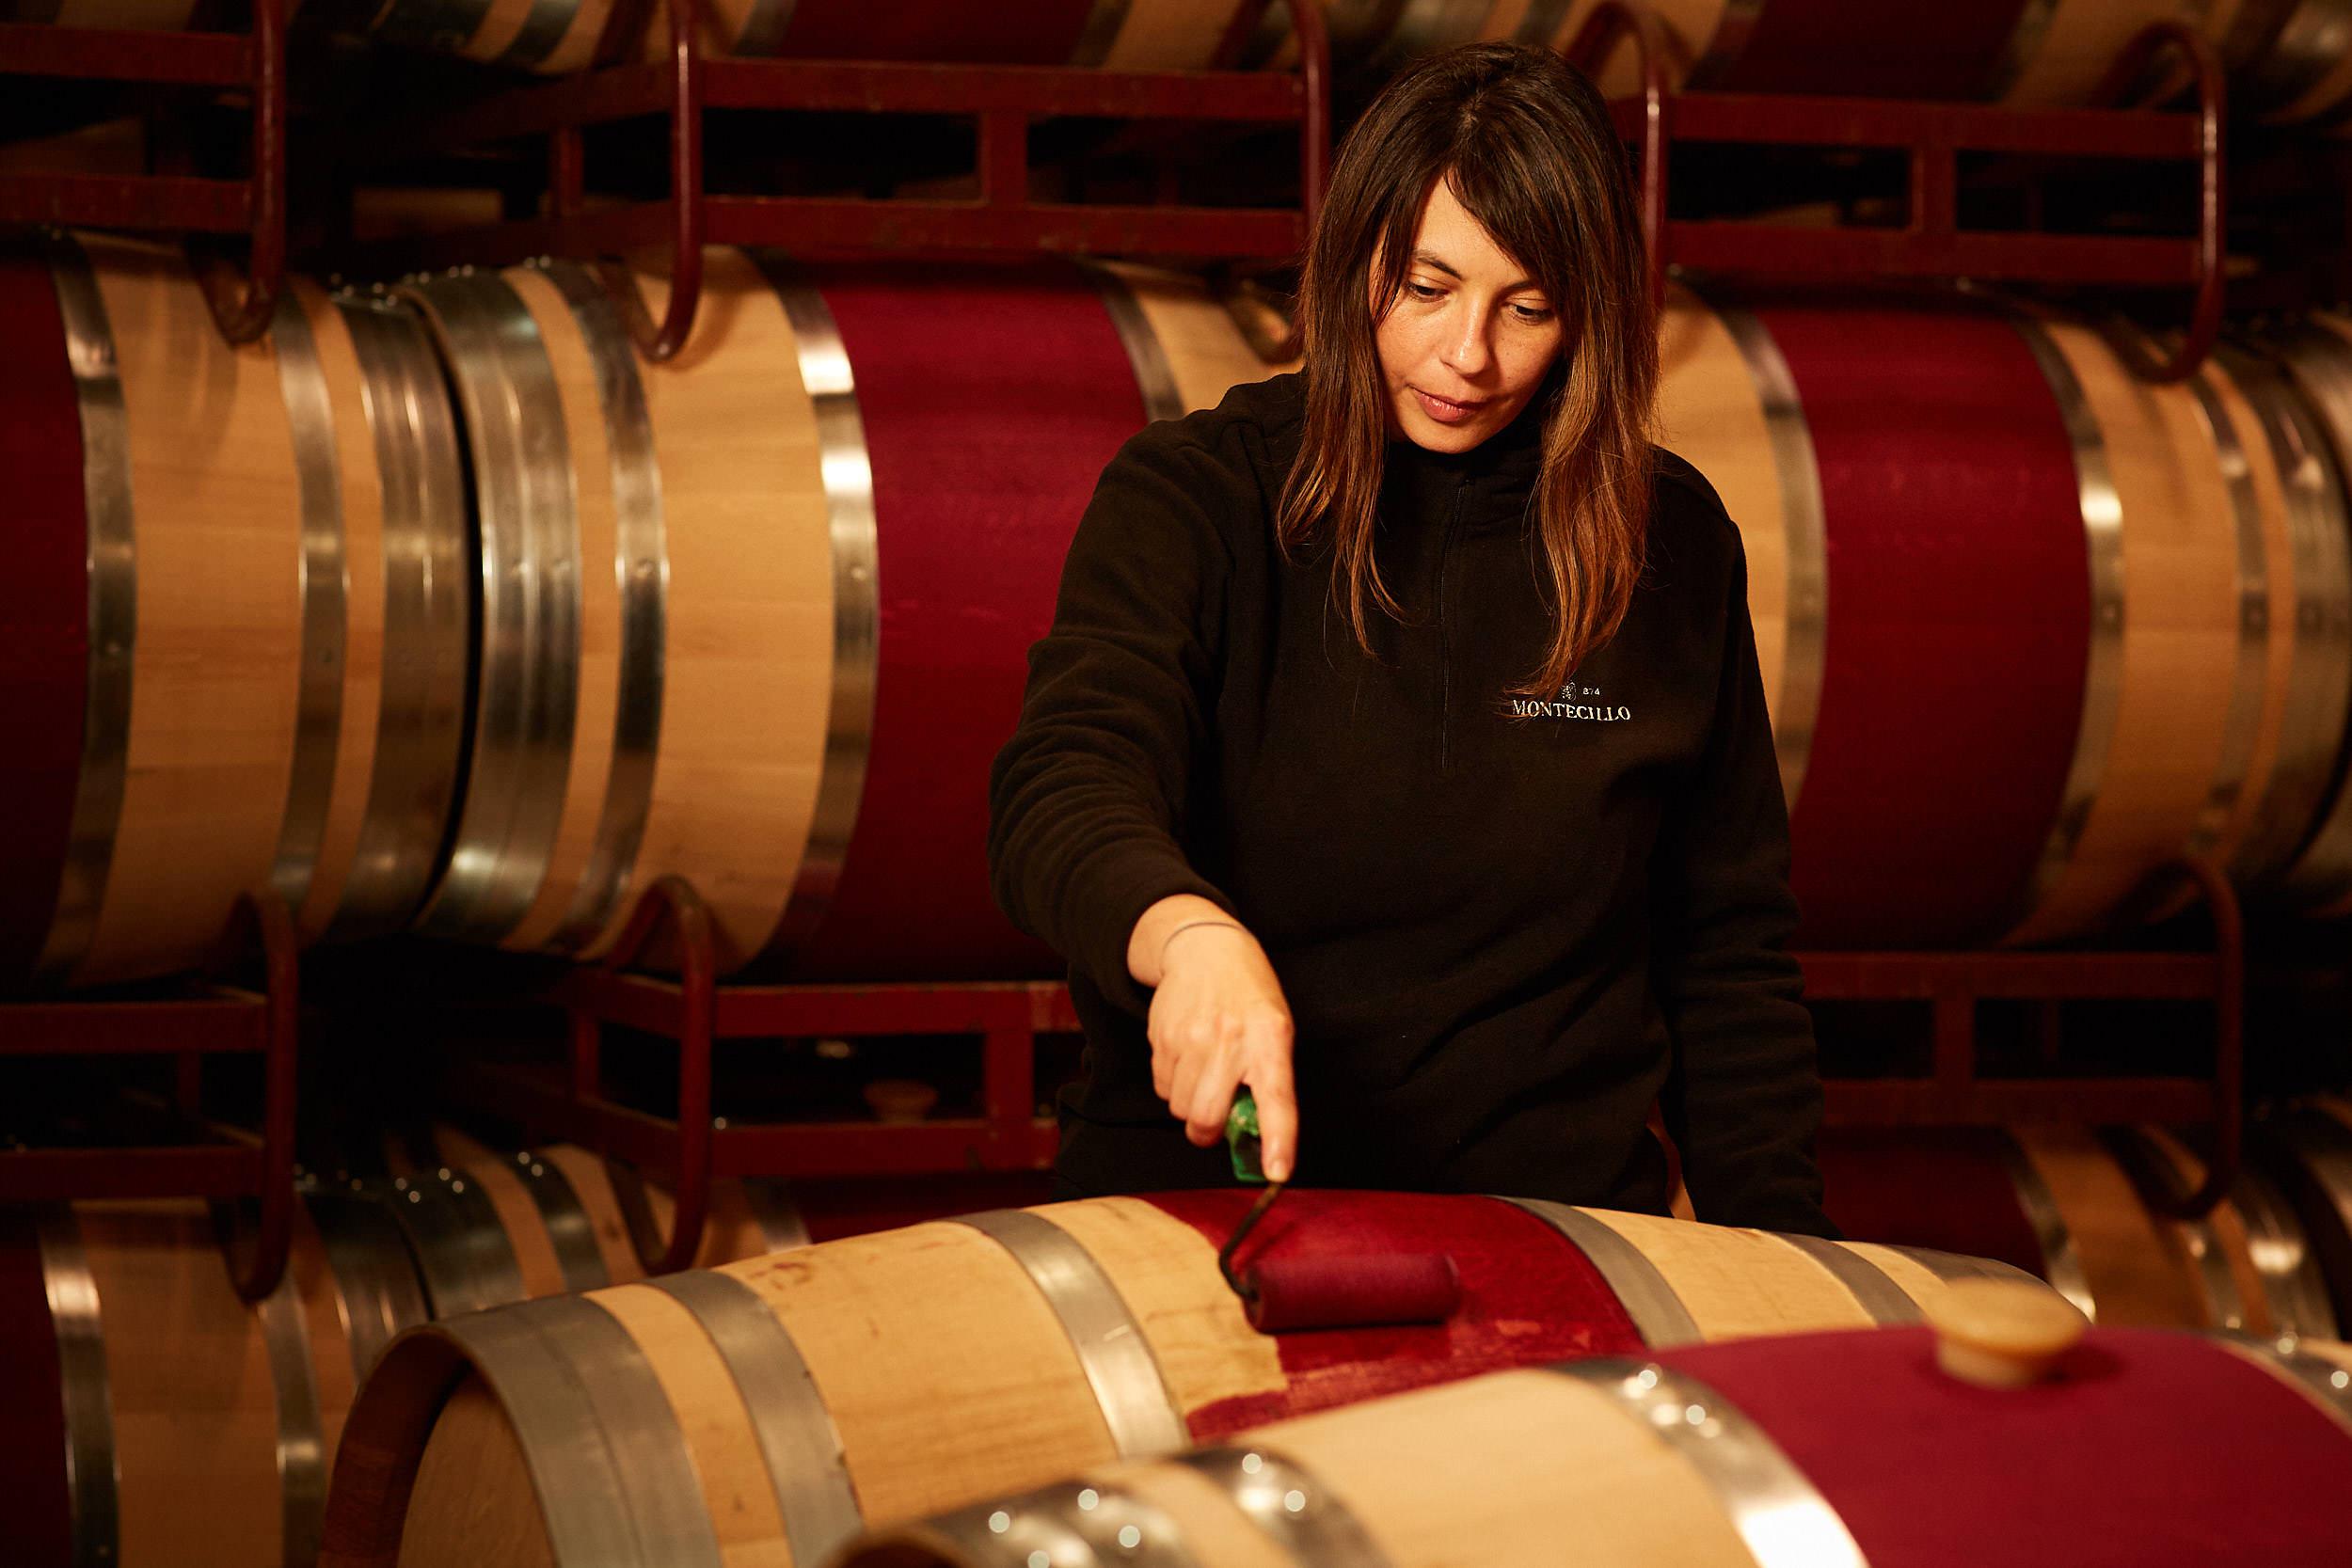 1805Commercial-professional-wine-photography-la-rioja-spain-James-Sturcke_0018.jpg